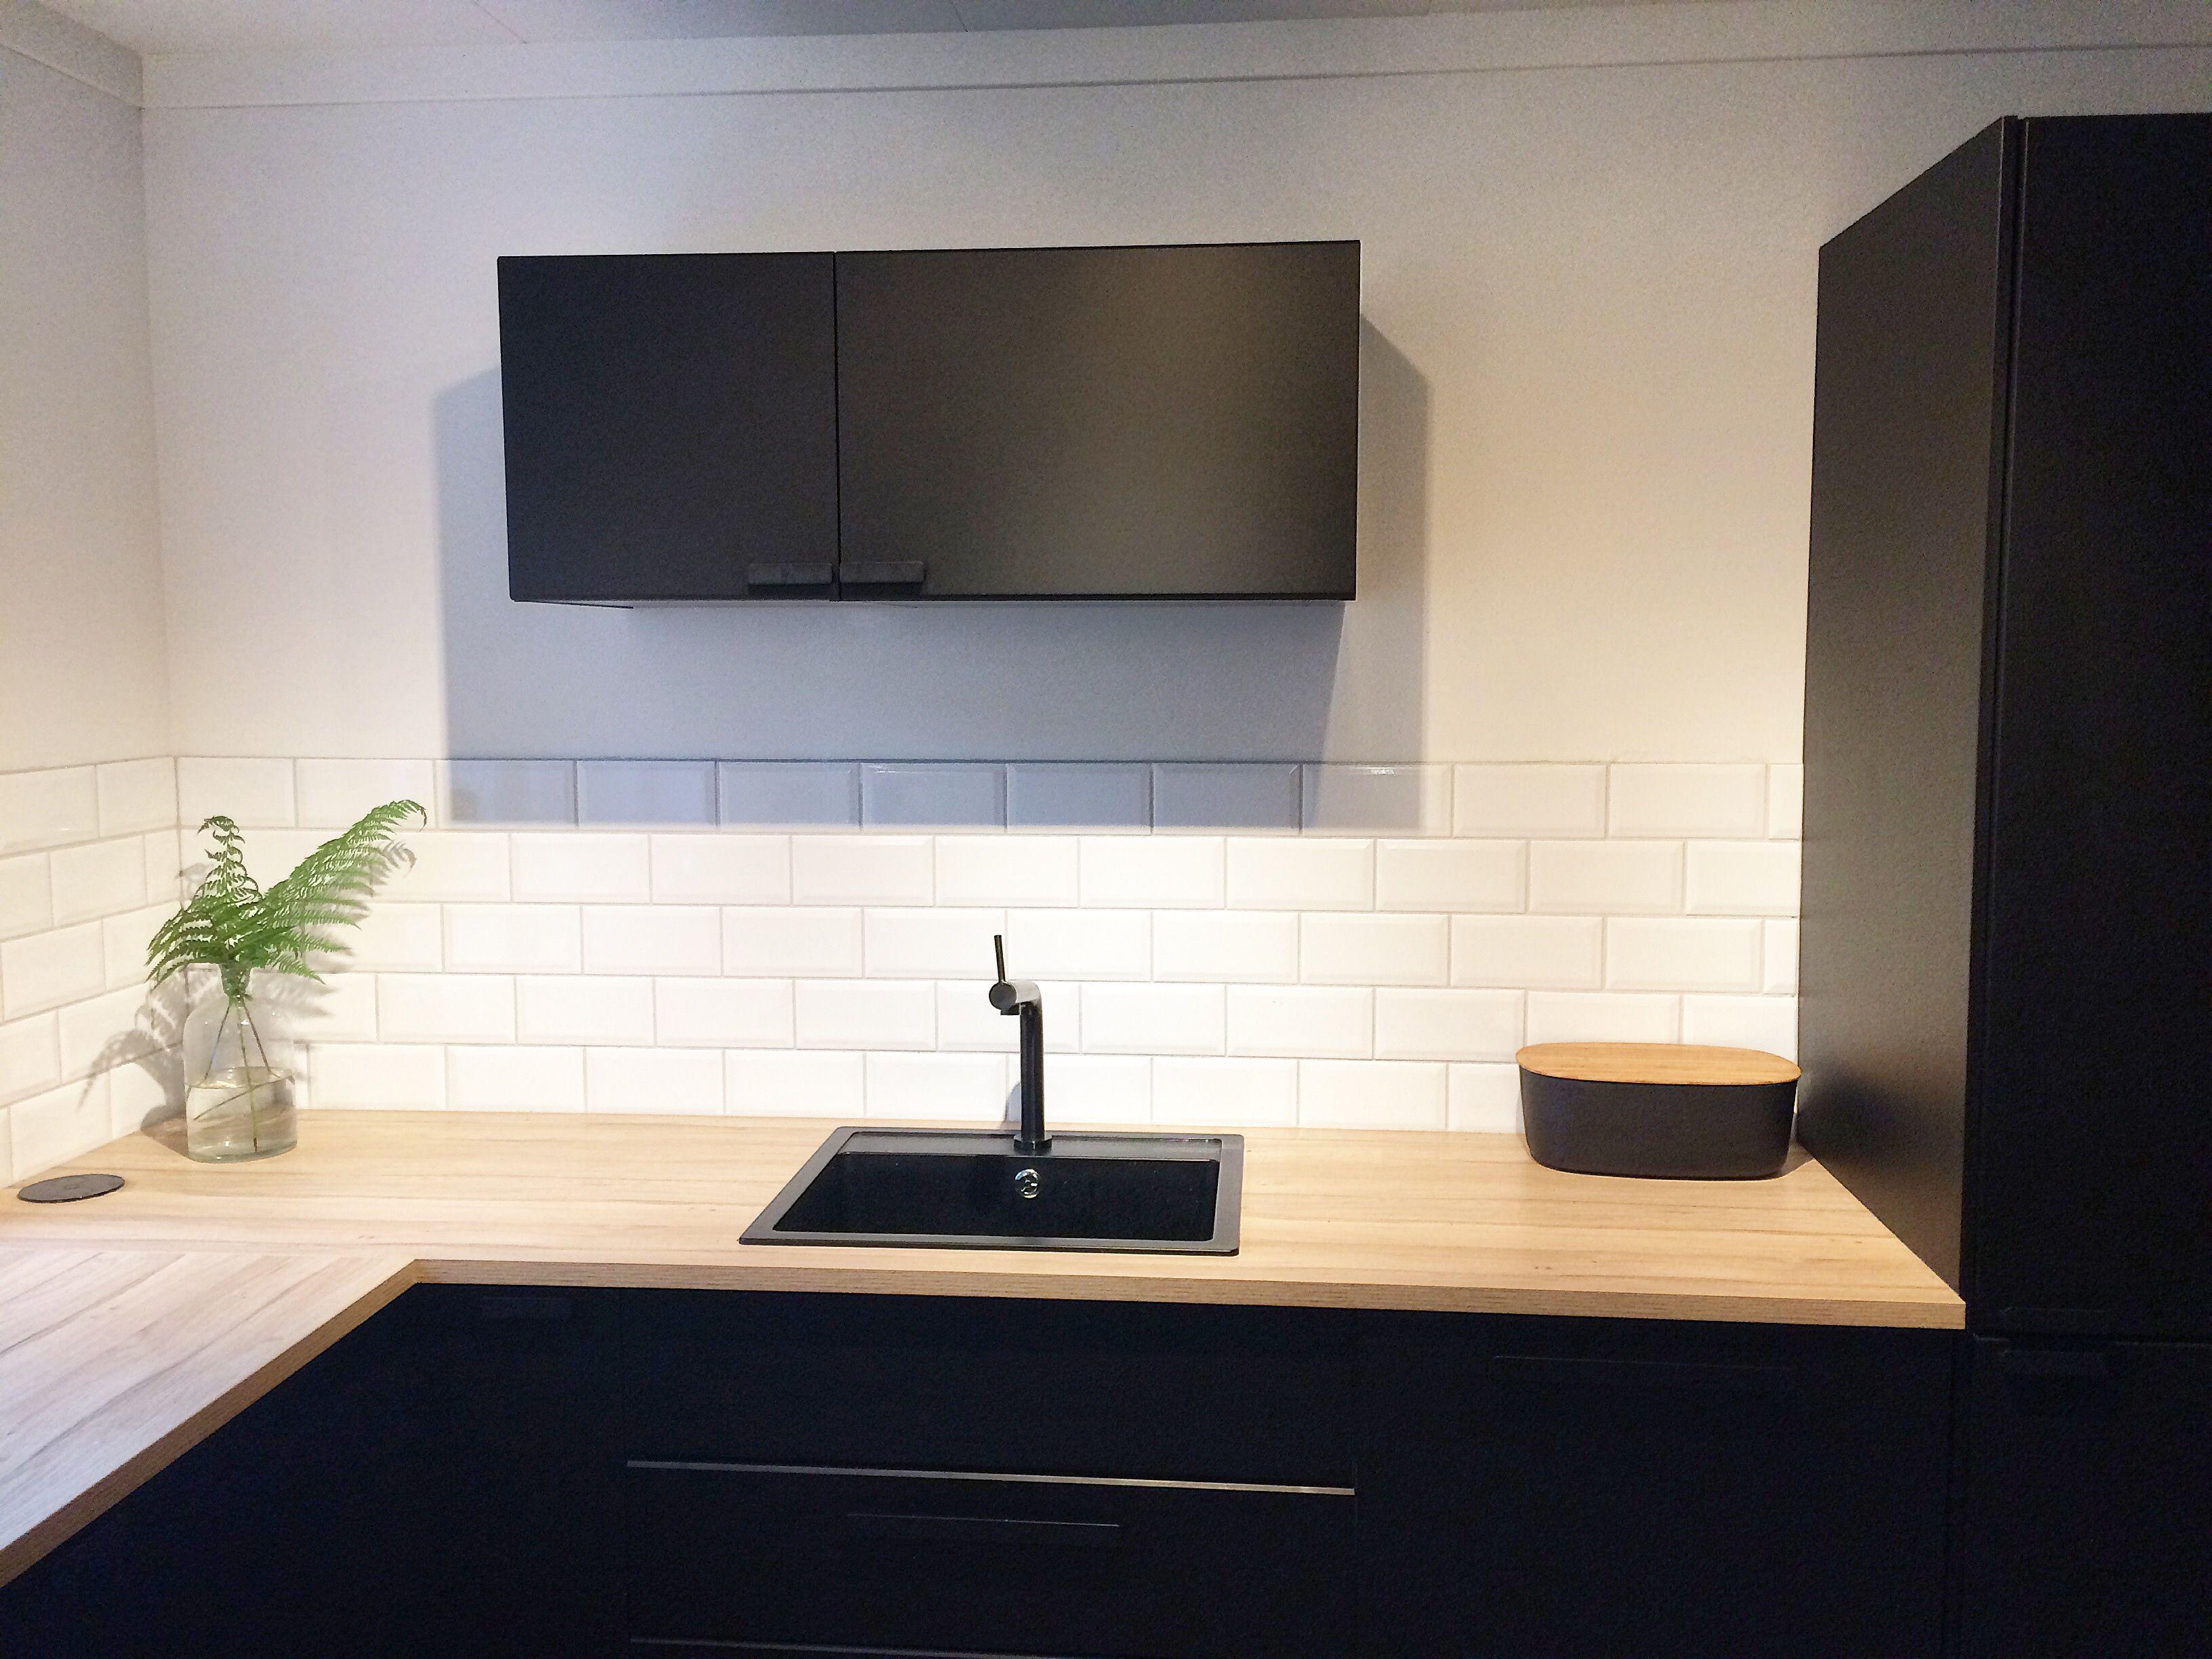 ikea kungsbacka k che k che hakenleiste k che und ikea k che. Black Bedroom Furniture Sets. Home Design Ideas